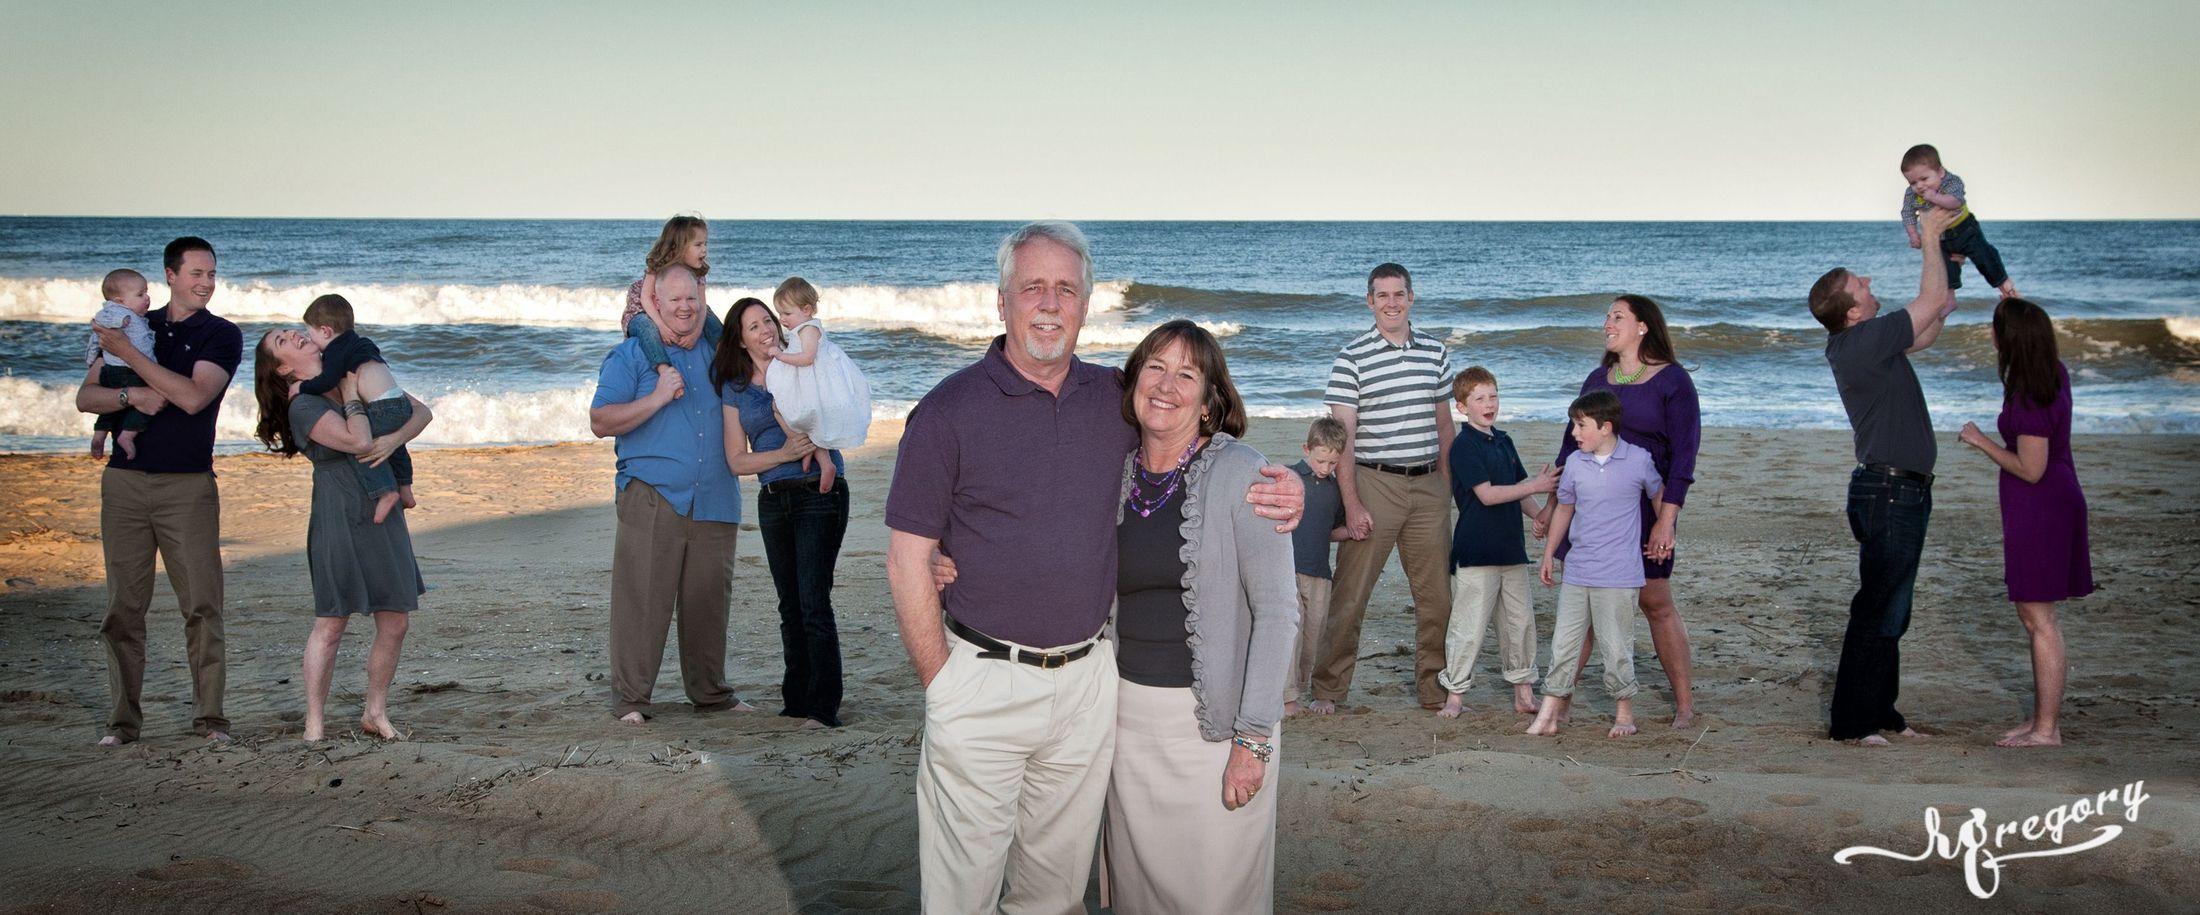 D Ammour multigenerational family reunion virginia beach photograph